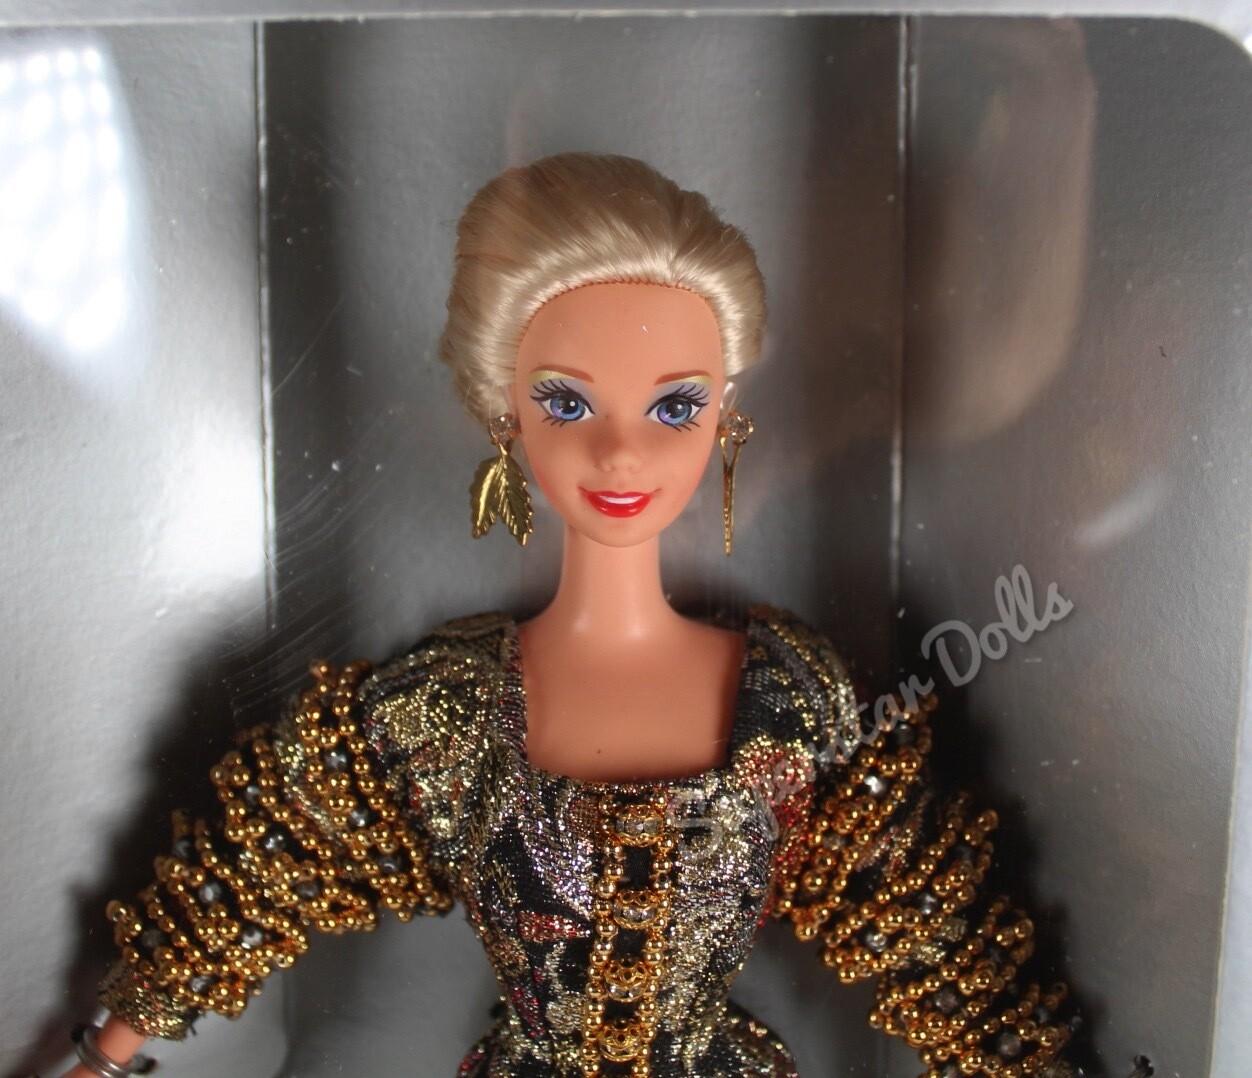 1995 Limited Edition Christian Dior Barbie Doll